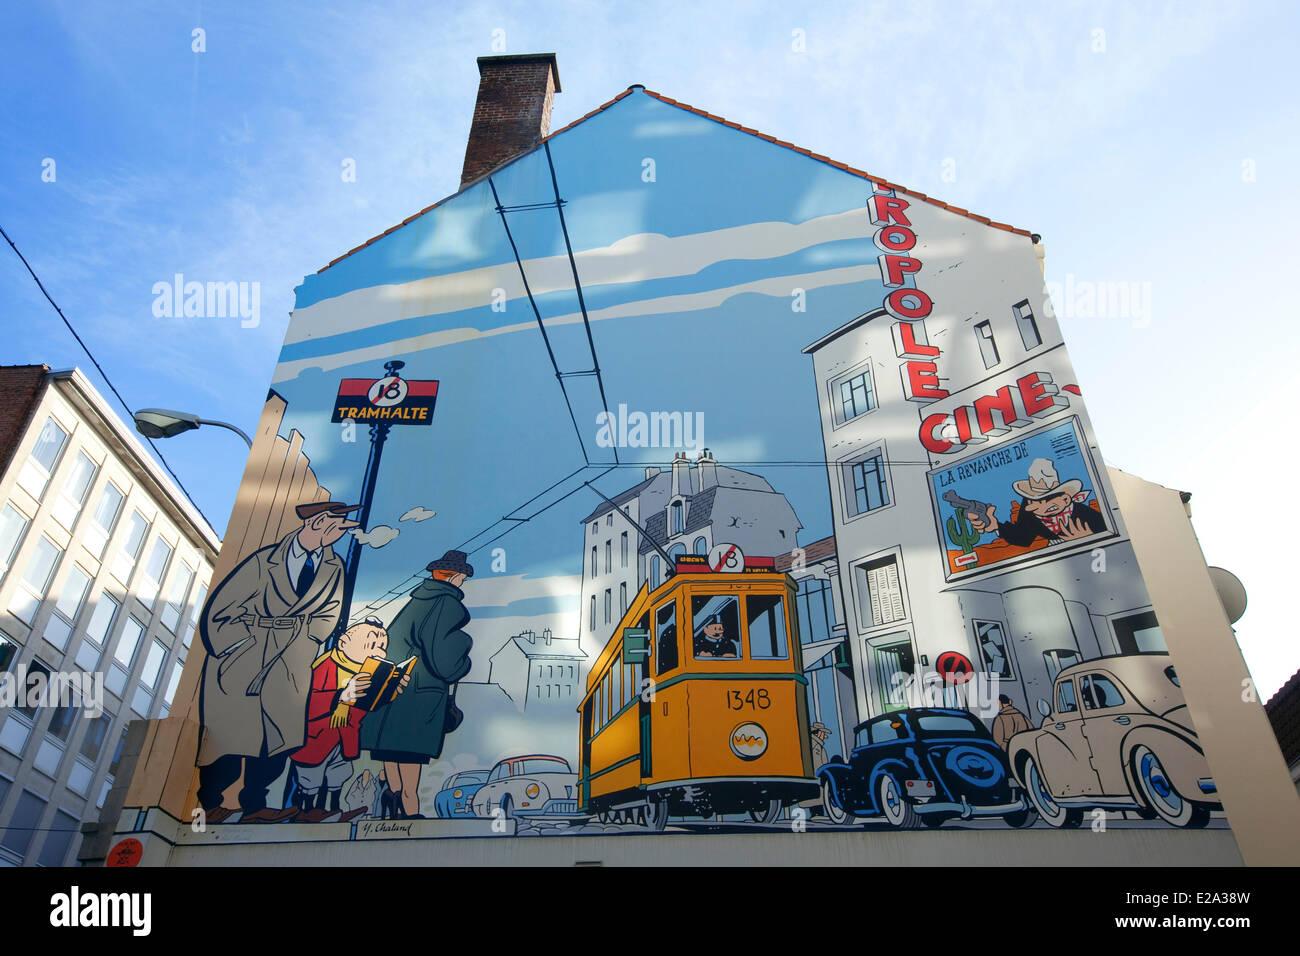 Belgien, Brüssel, Comic-Strip-Trail der Stadt, Straße, Alexian Yves Le Jeune Albert Barge (Mai 2000) Stockbild